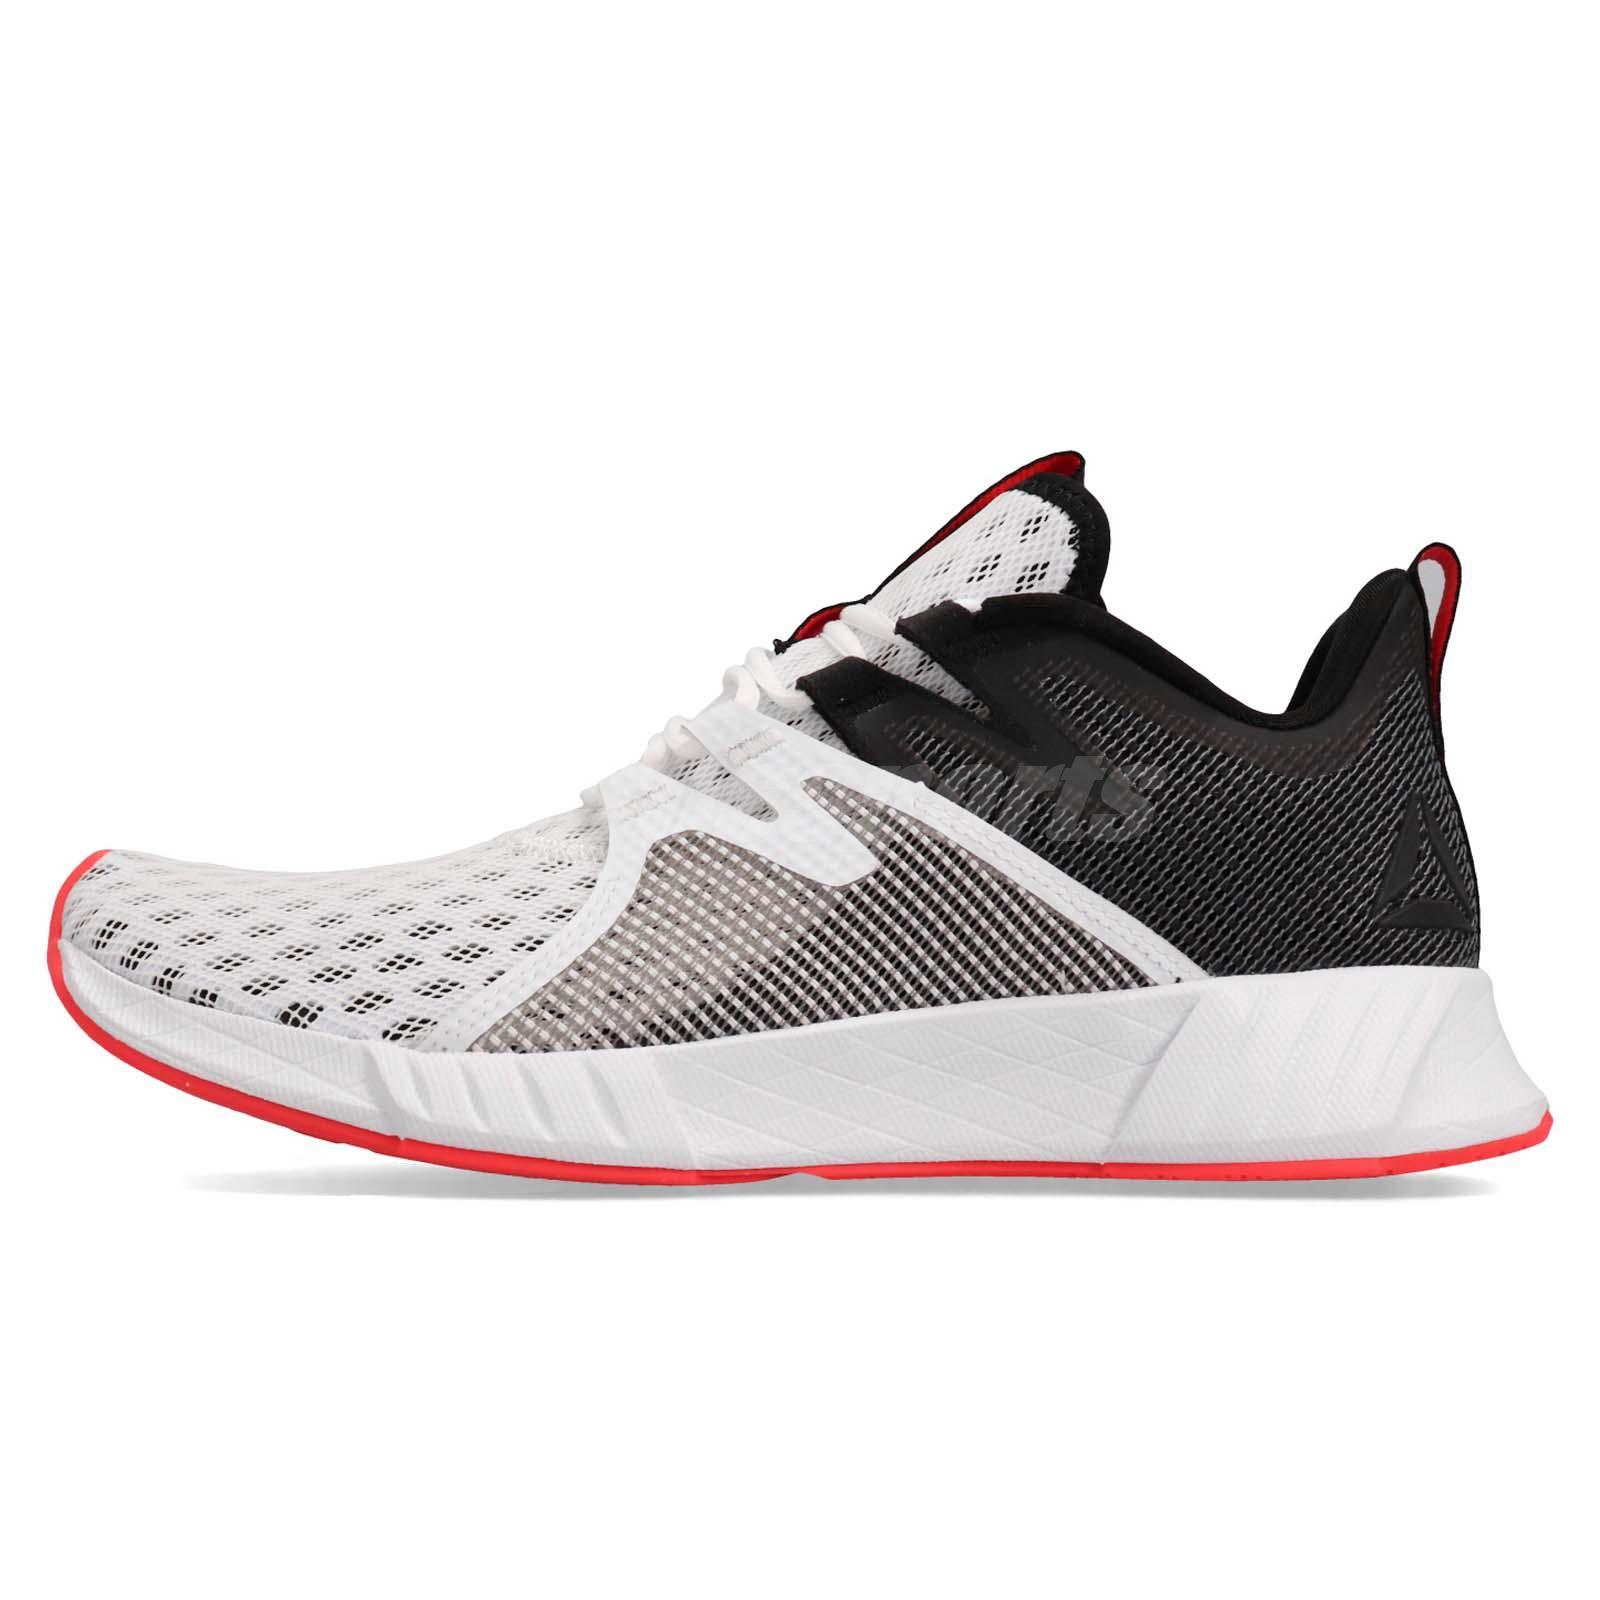 540b589019 Details about Reebok Fusium Run 2.0 White Black Red Men Running Training  Shoes Sneakers DV4222